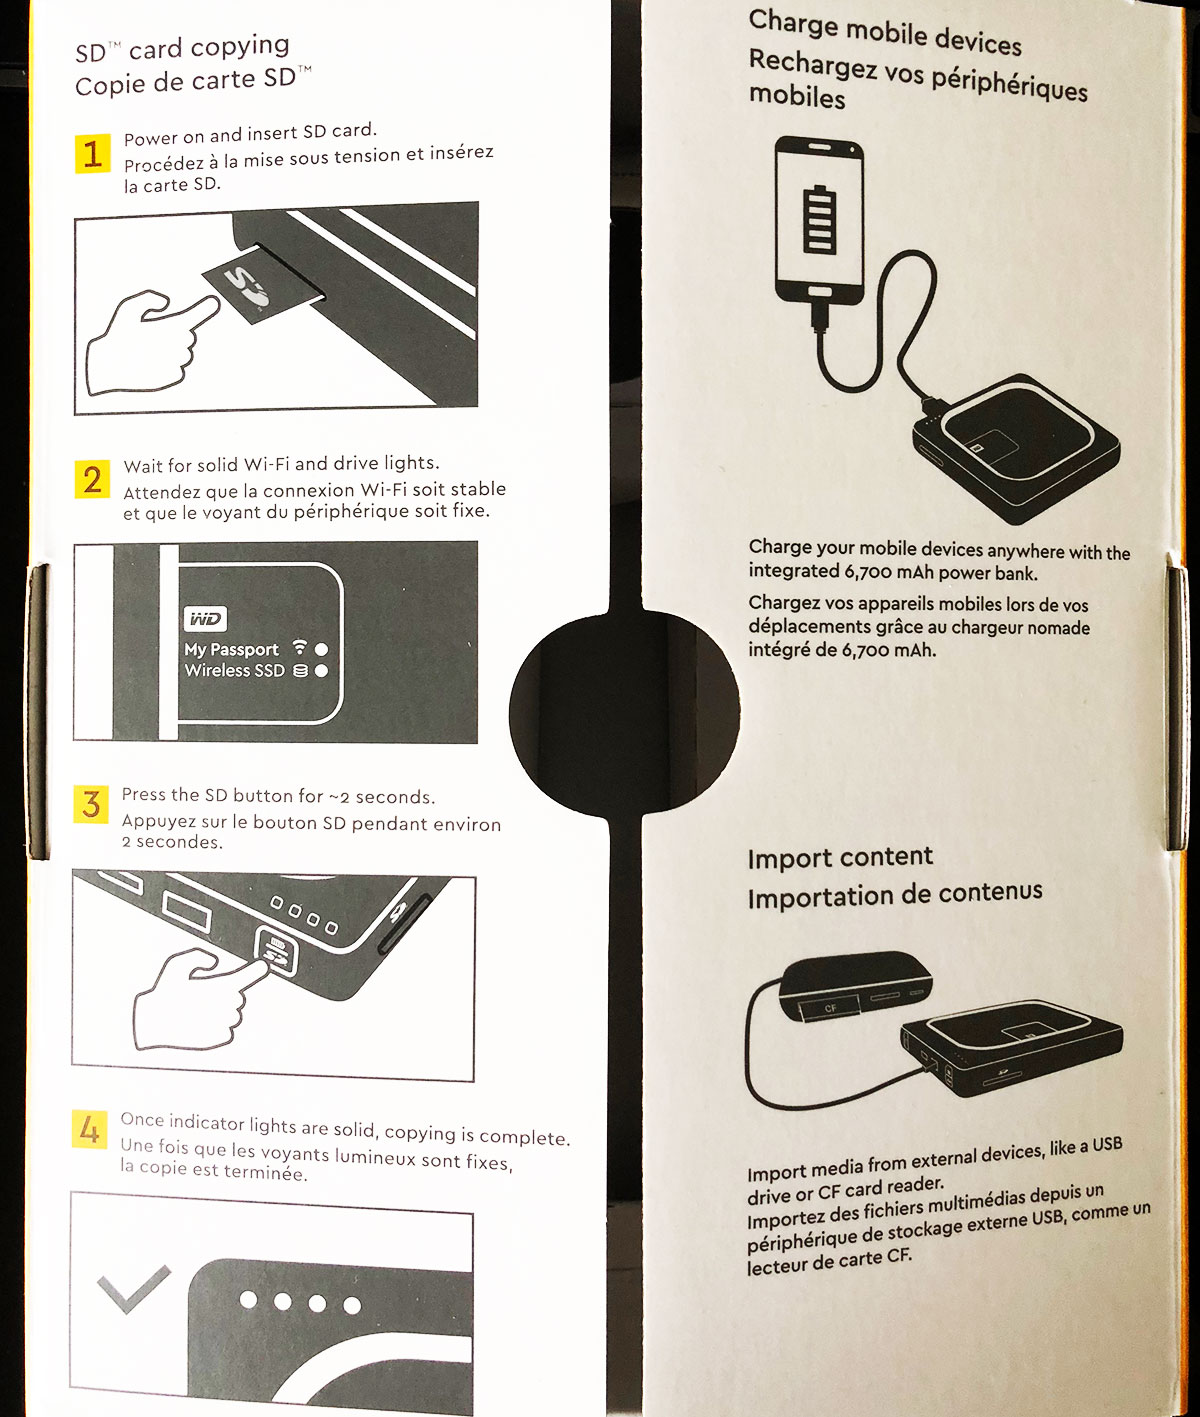 Wd My Passport Wireless Pro Speed Nbox Hdtv Recorder Nc Best Hd Tv In 2018 Home Smart Tracking Full Hd Ip Camera: Western Digital My Passport Wireless SSD Review